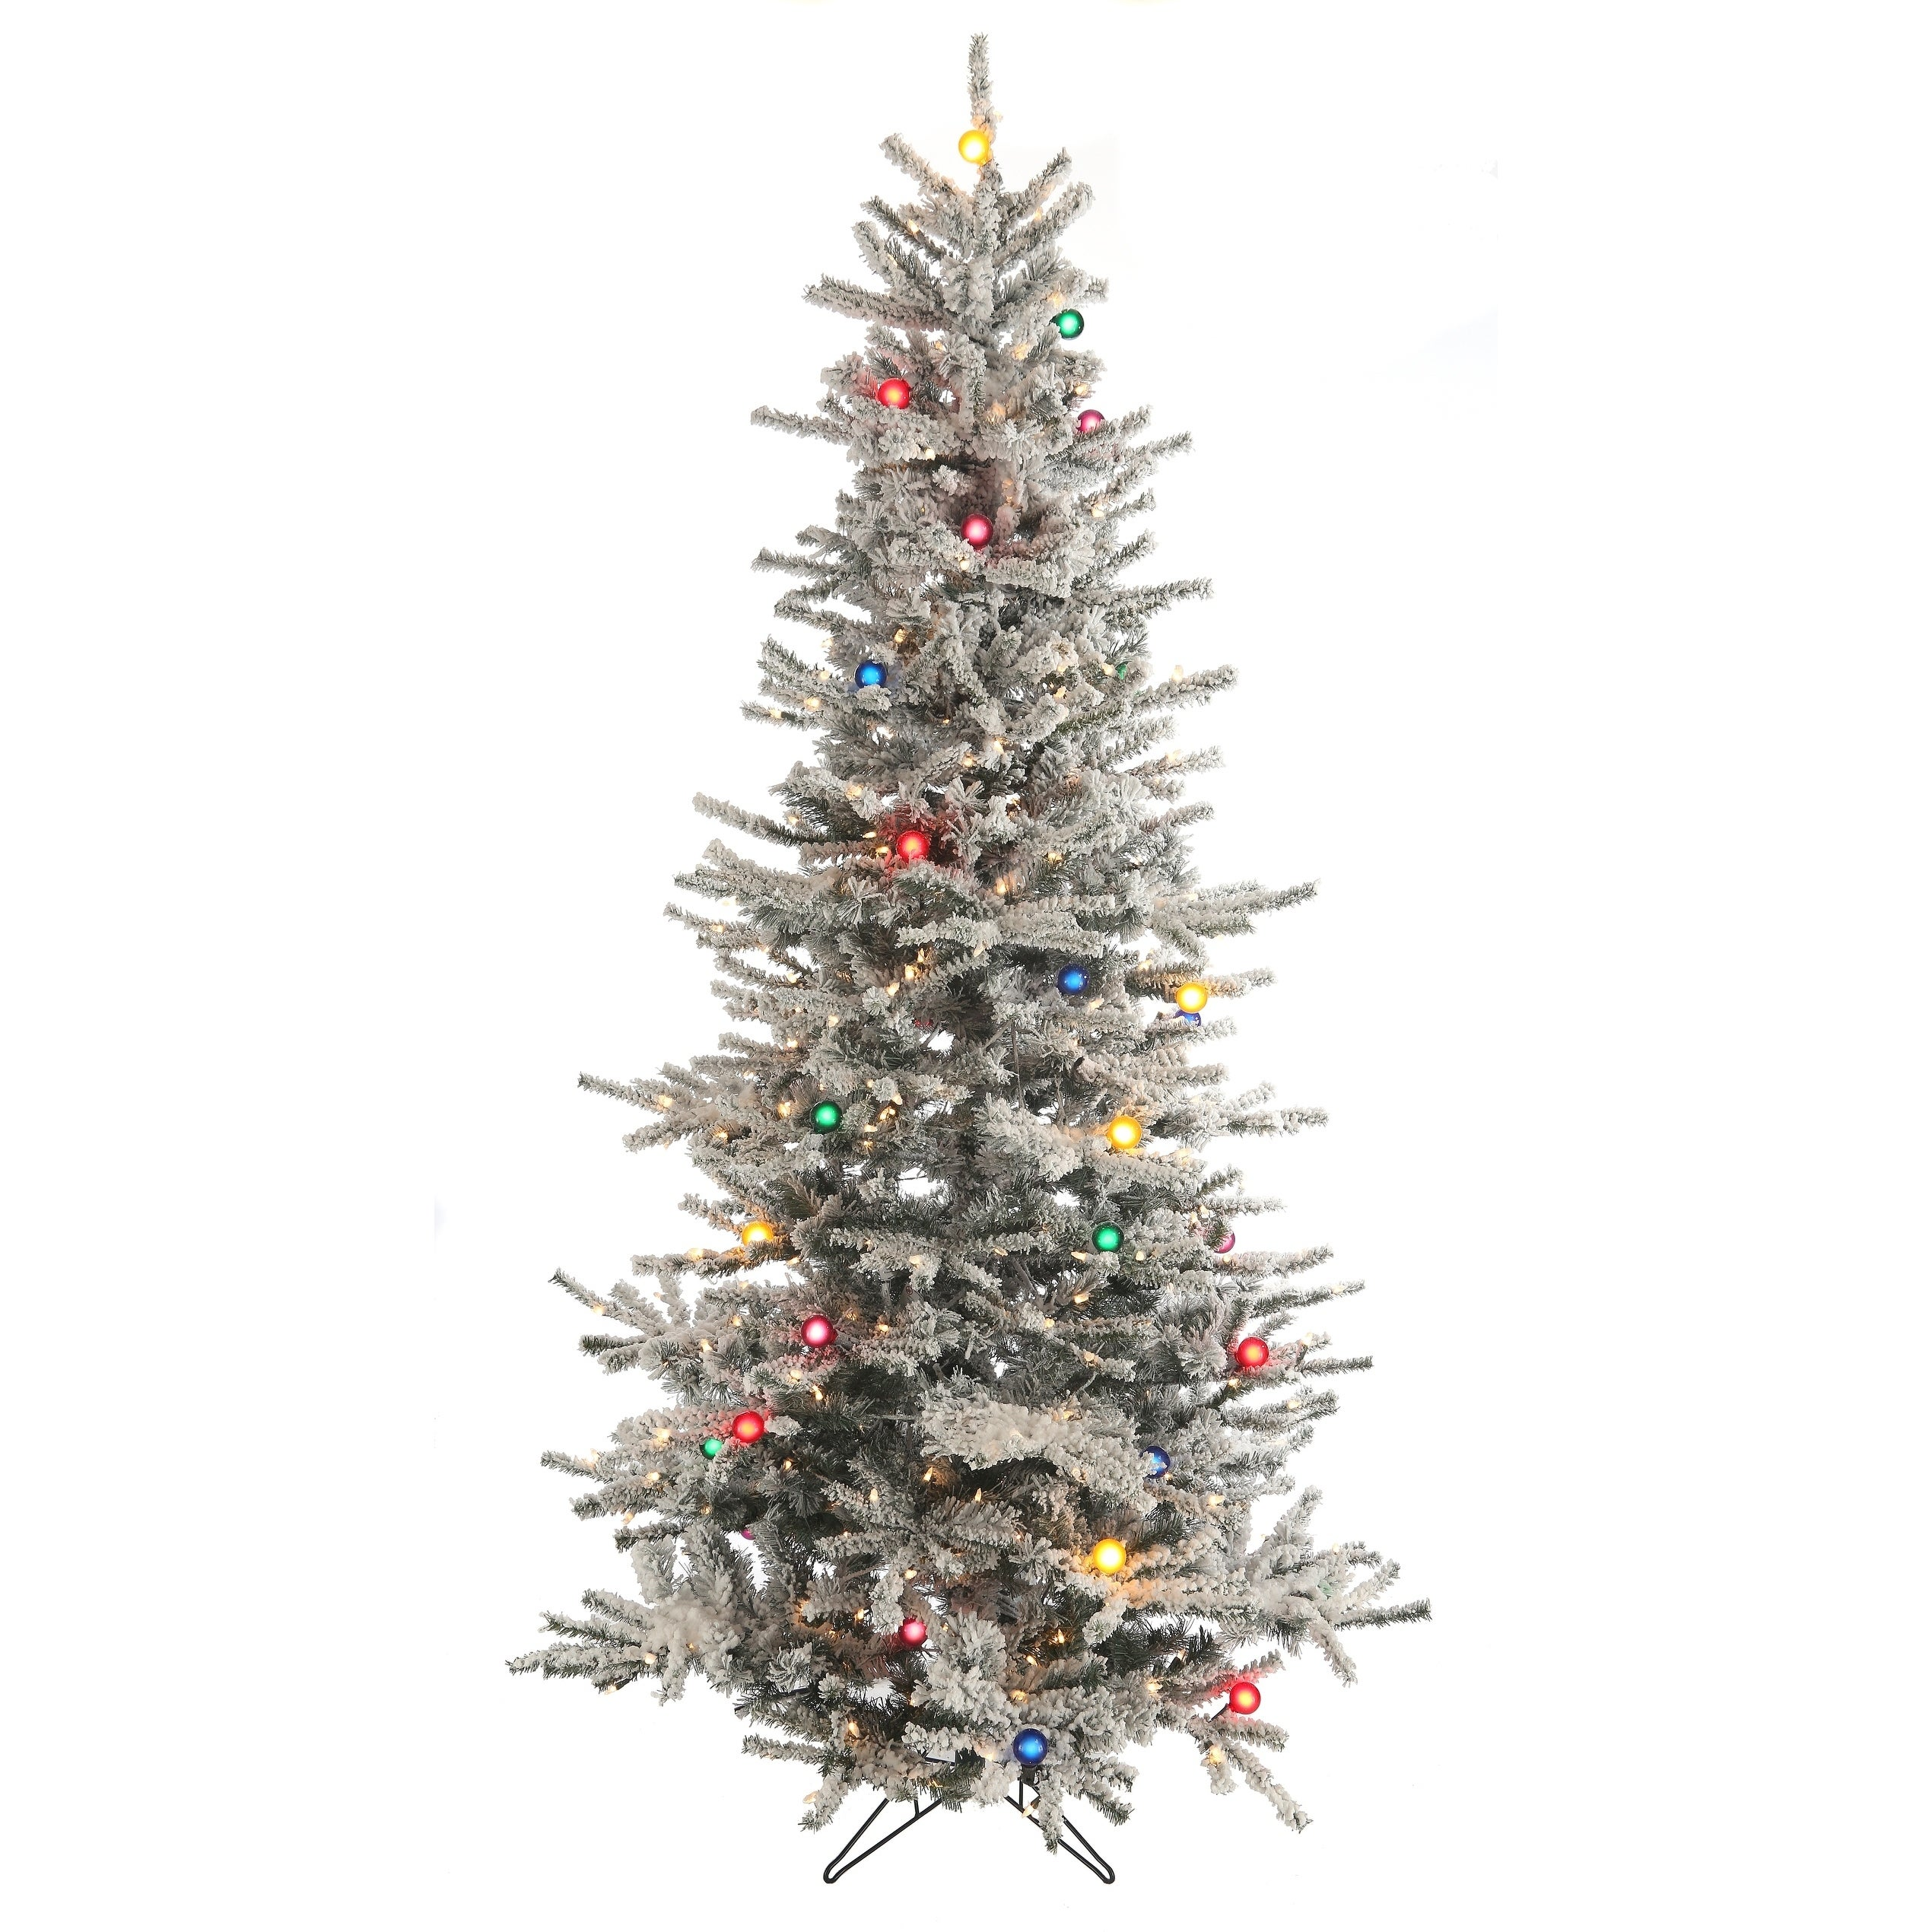 Slim Flocked Christmas Tree With Lights.Pre Lit 7 5 Ft Slim Flocked Vail Tree With G40 Multi Lights